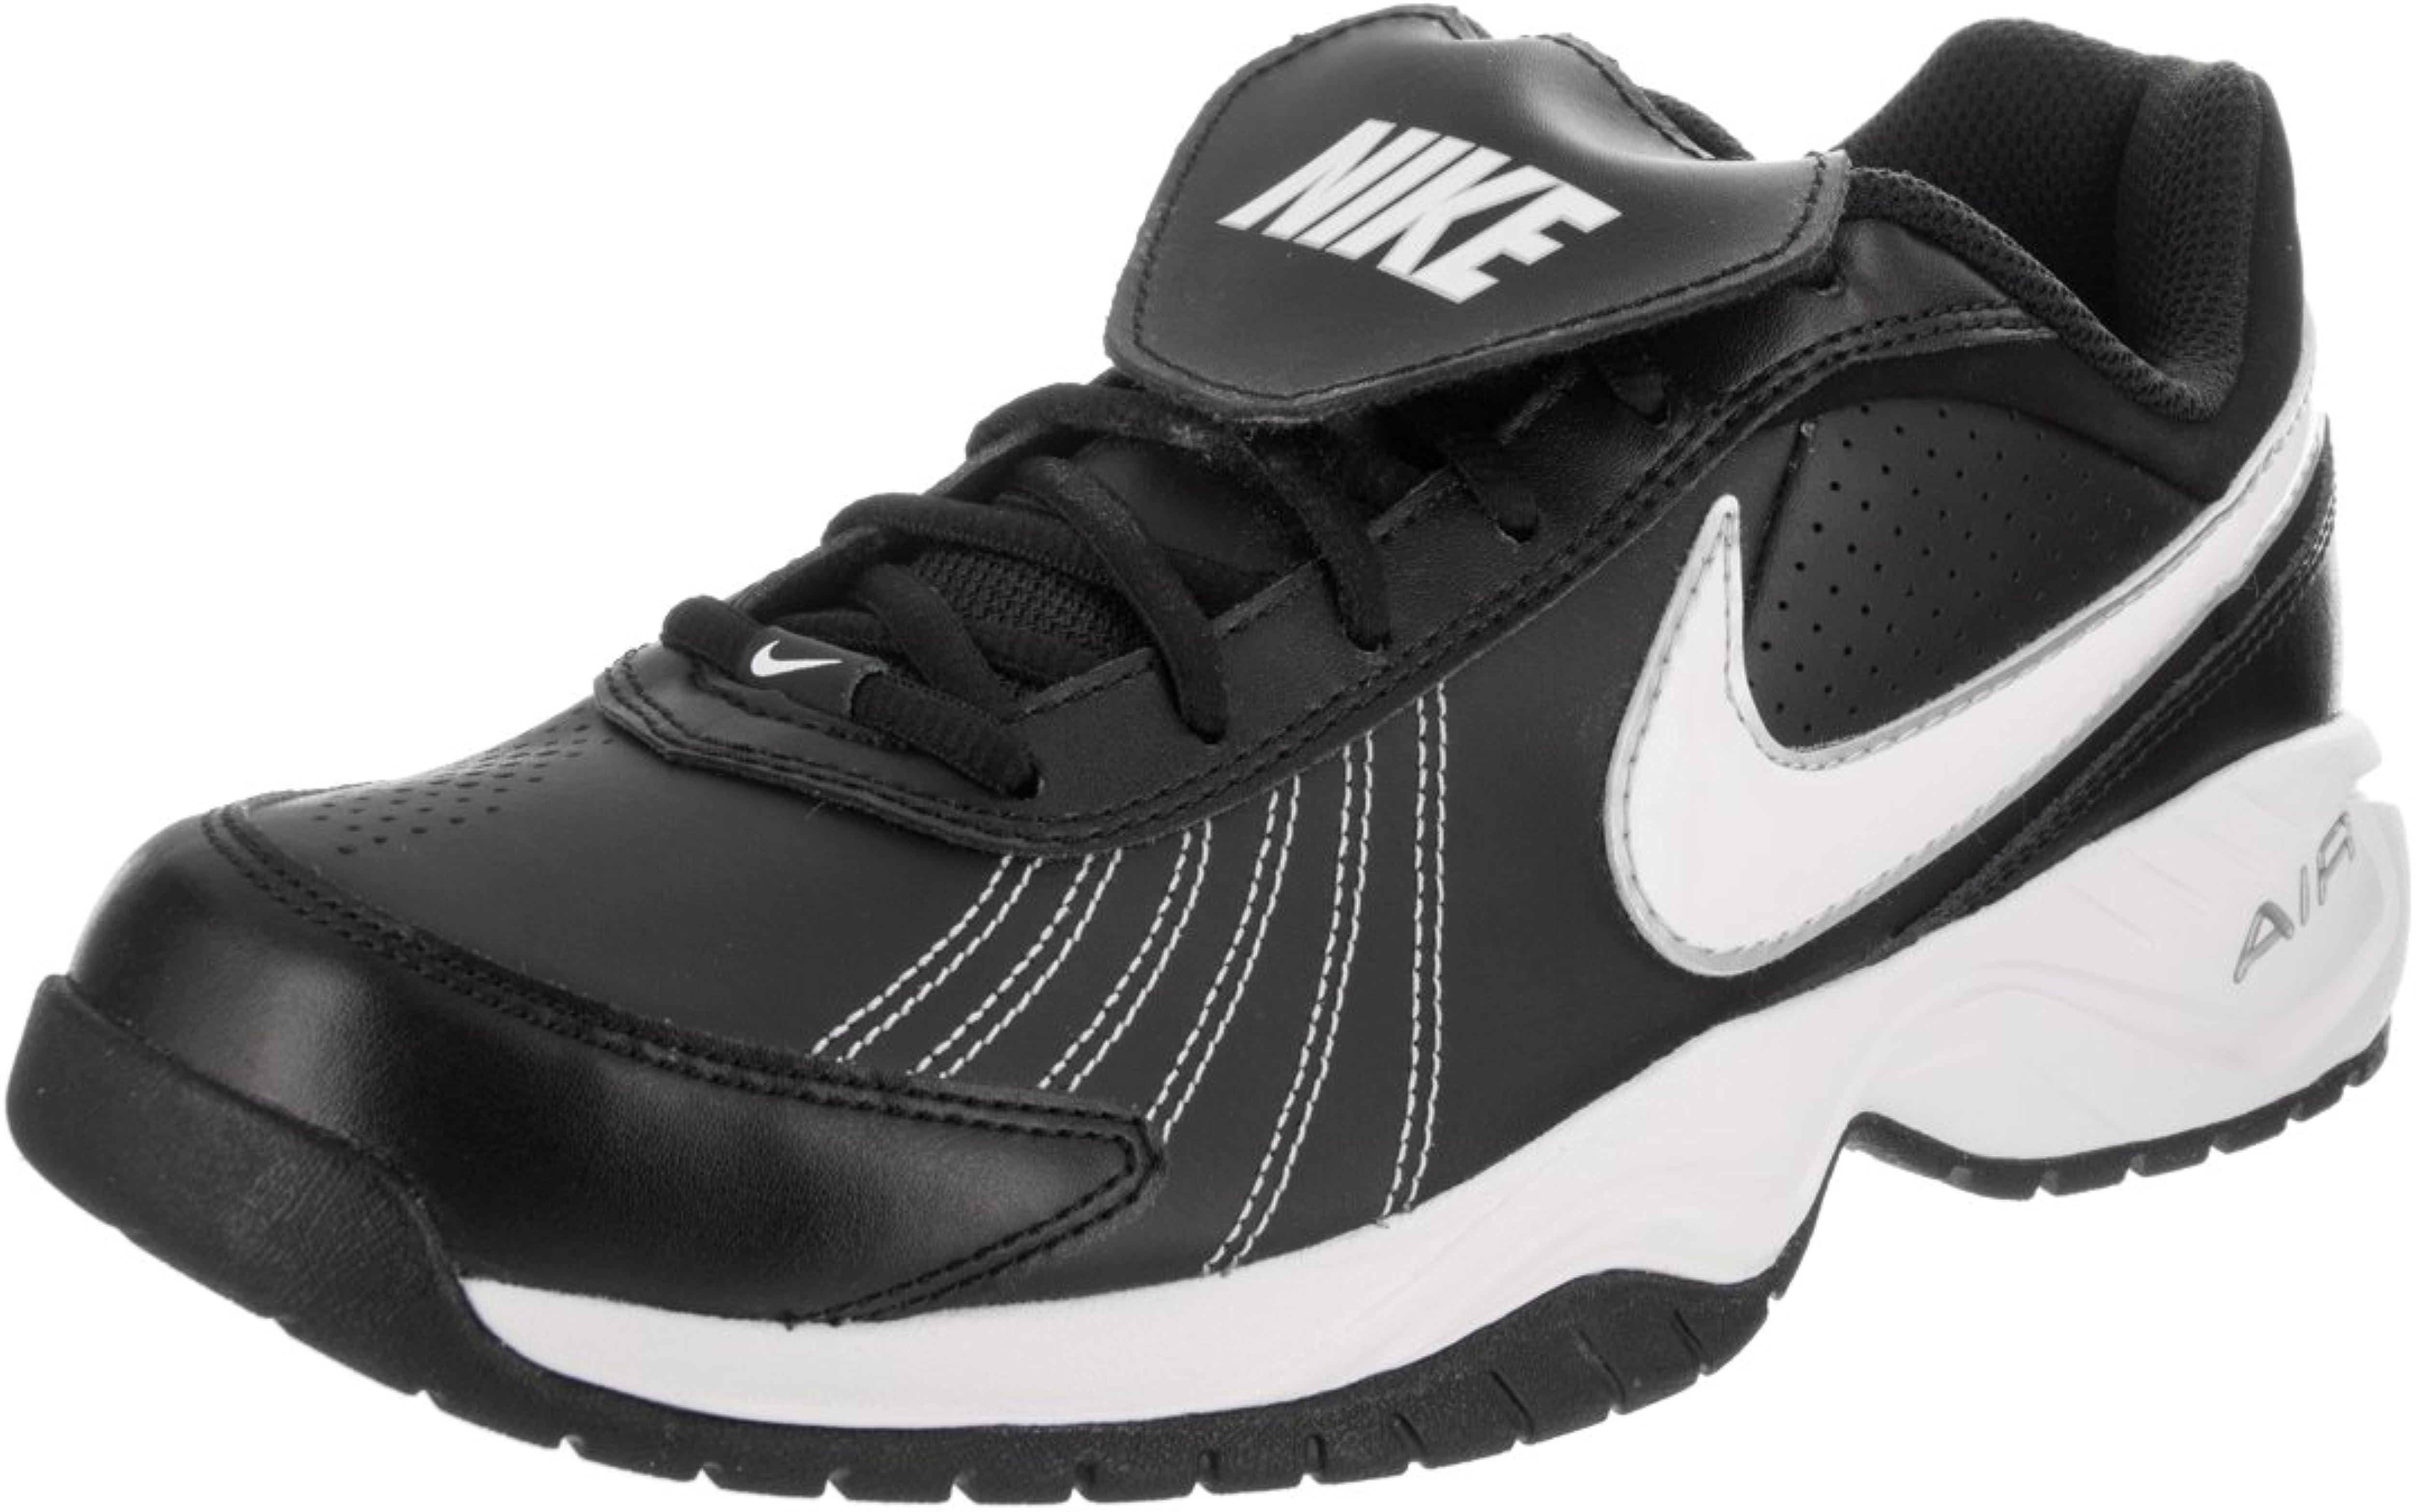 Nike Men's Air Diamond Trainer